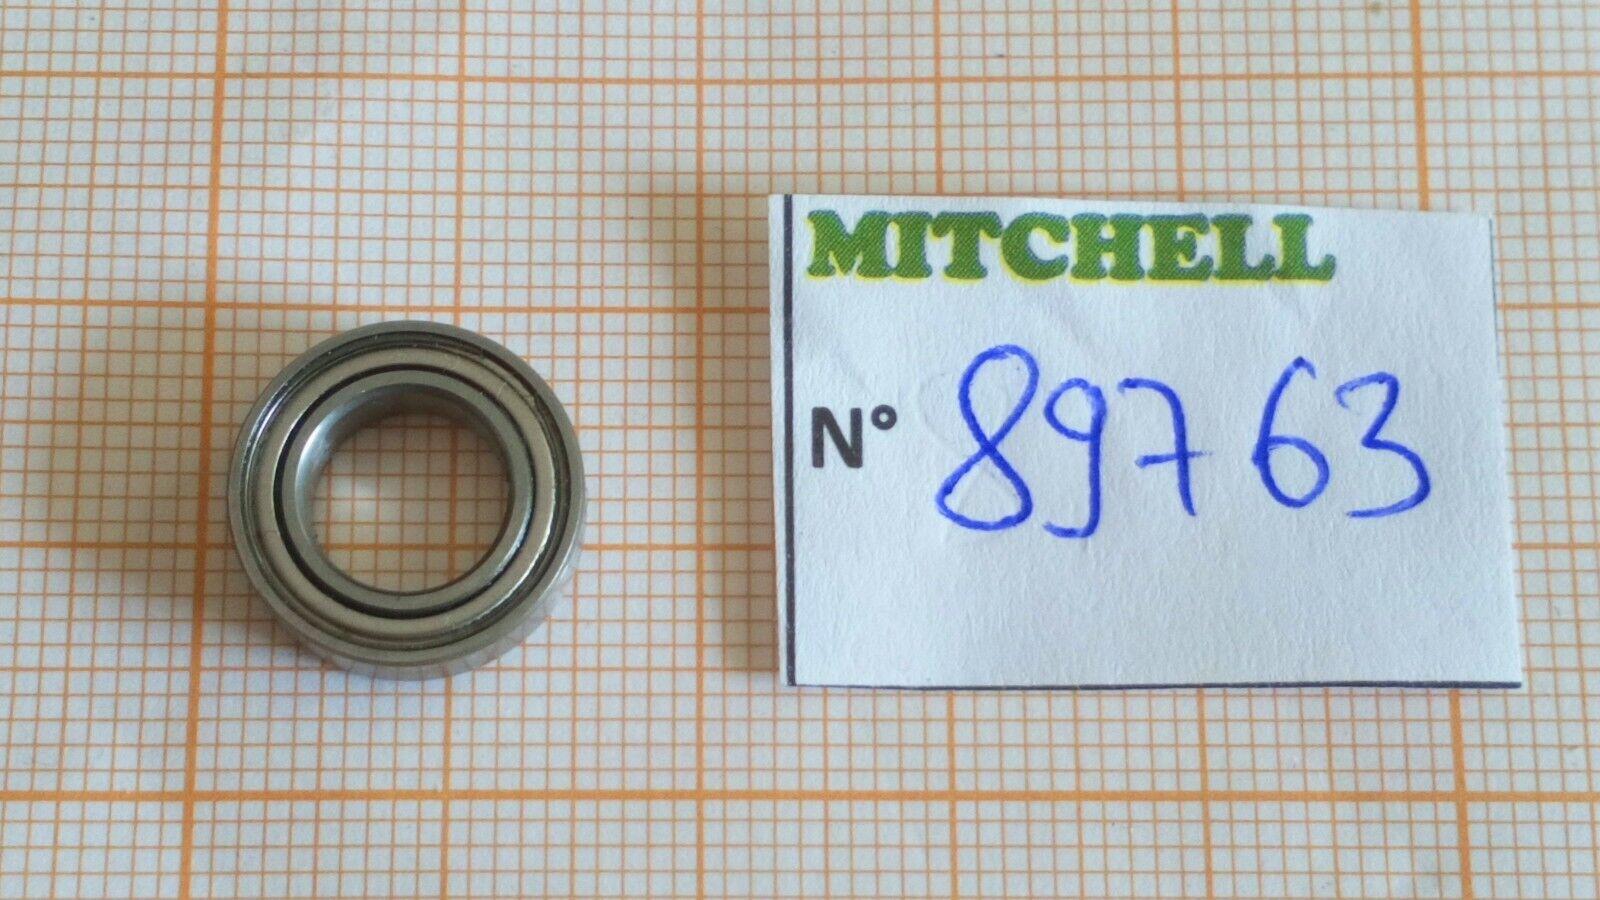 ROULEMENT 85055 MITCHELL 40 PRESTIGE autre MOULINET STEEL BALL BEARING REEL PART